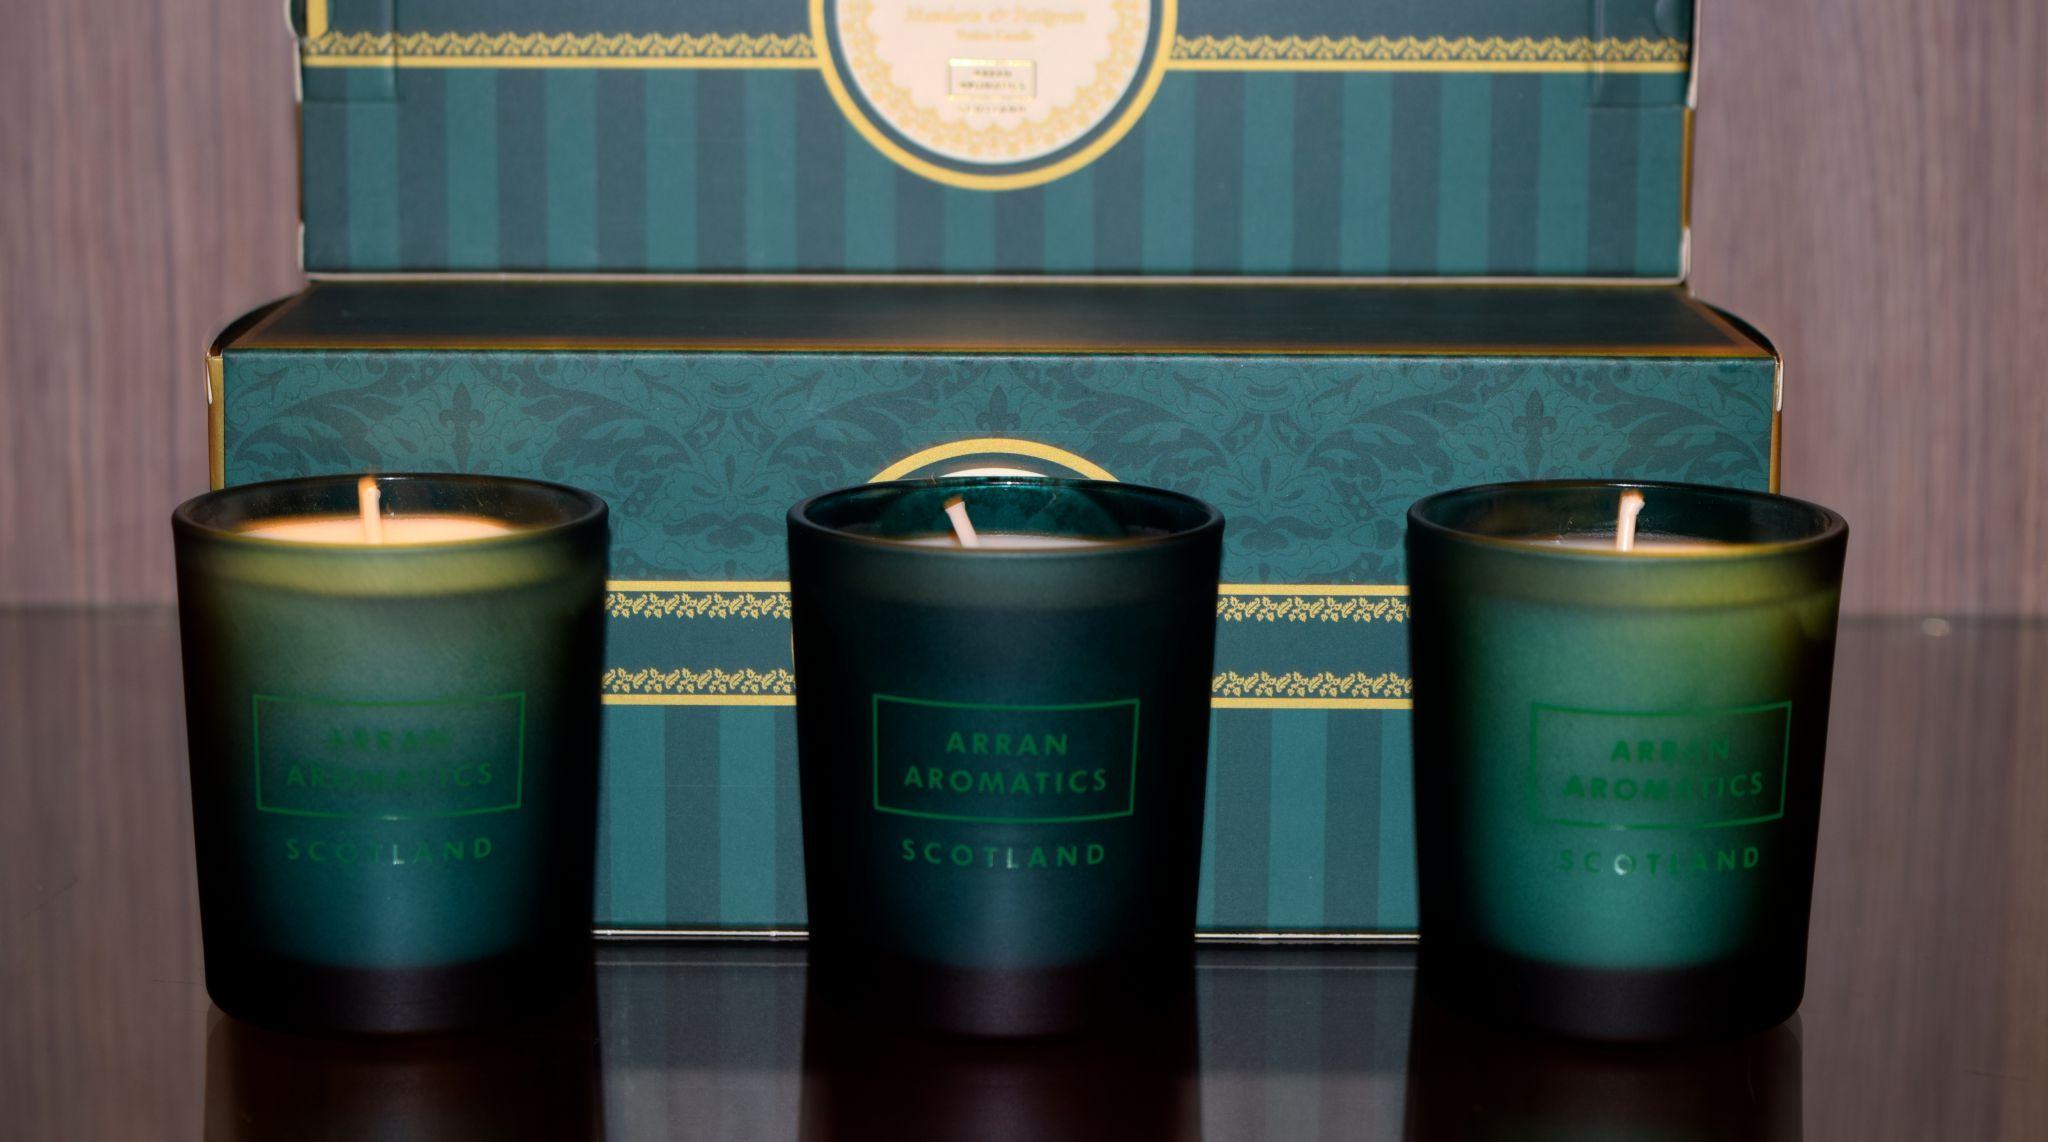 Arran Aromatics Edinburgh store 12